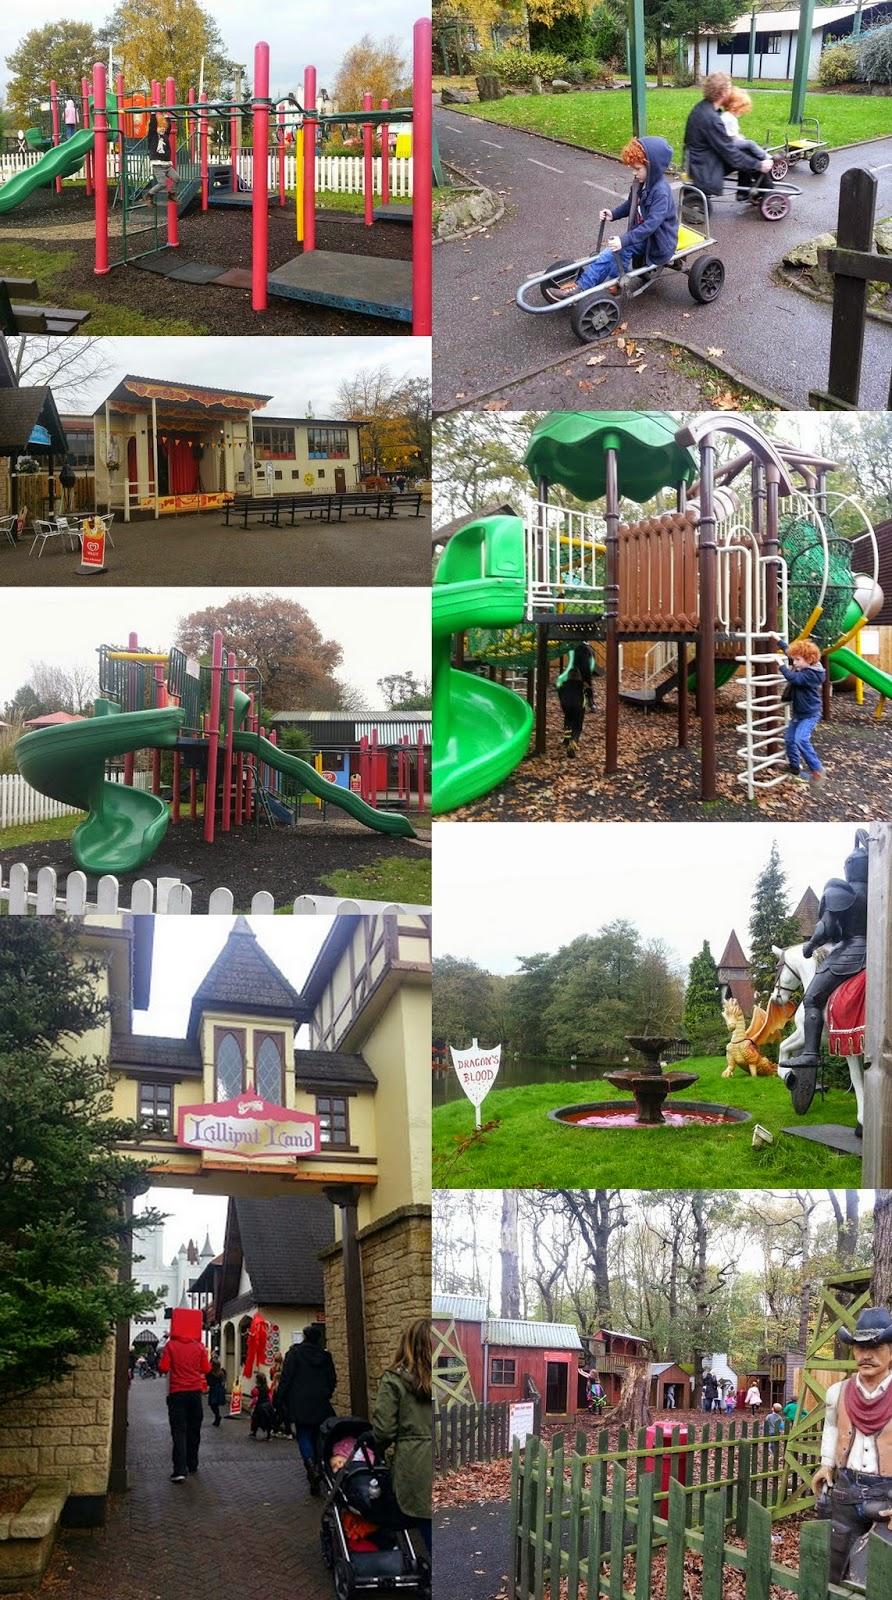 Gulliver's World Children's theme parkLilliput land play areas and amusements